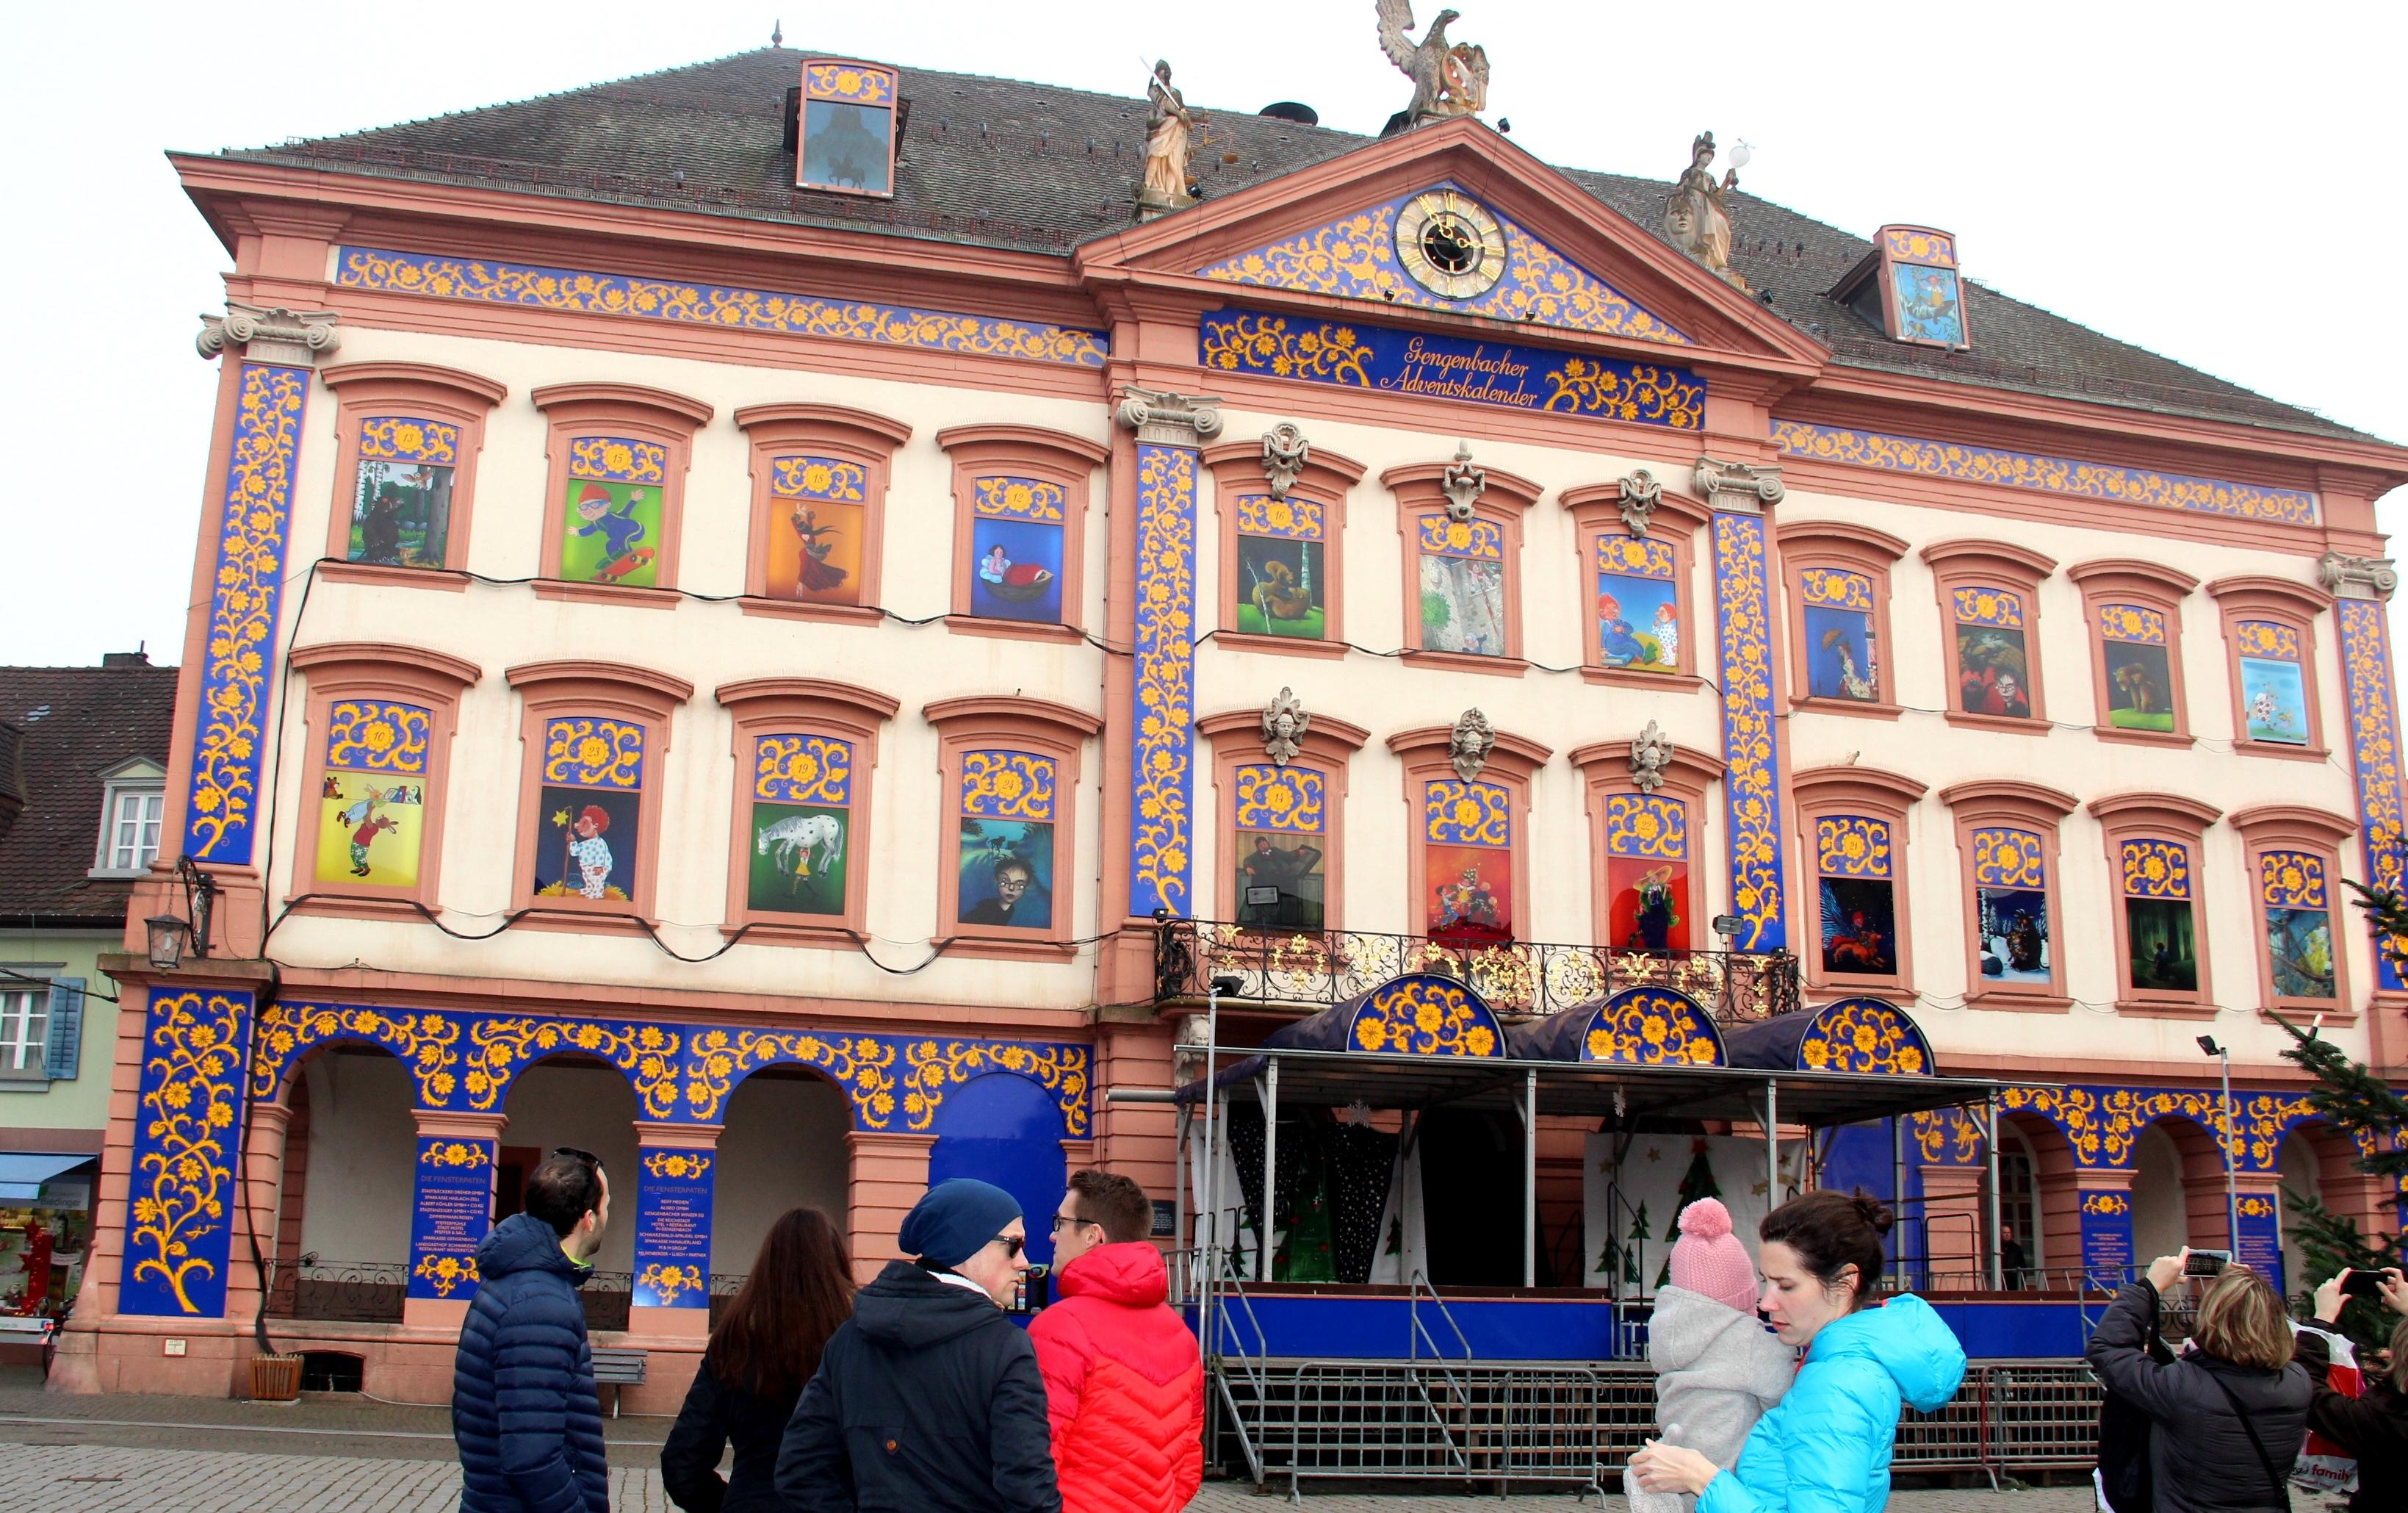 Weihnachtskalender Wiki.File Gengenbacher Adventskalender Germany Jpg Wikimedia Commons